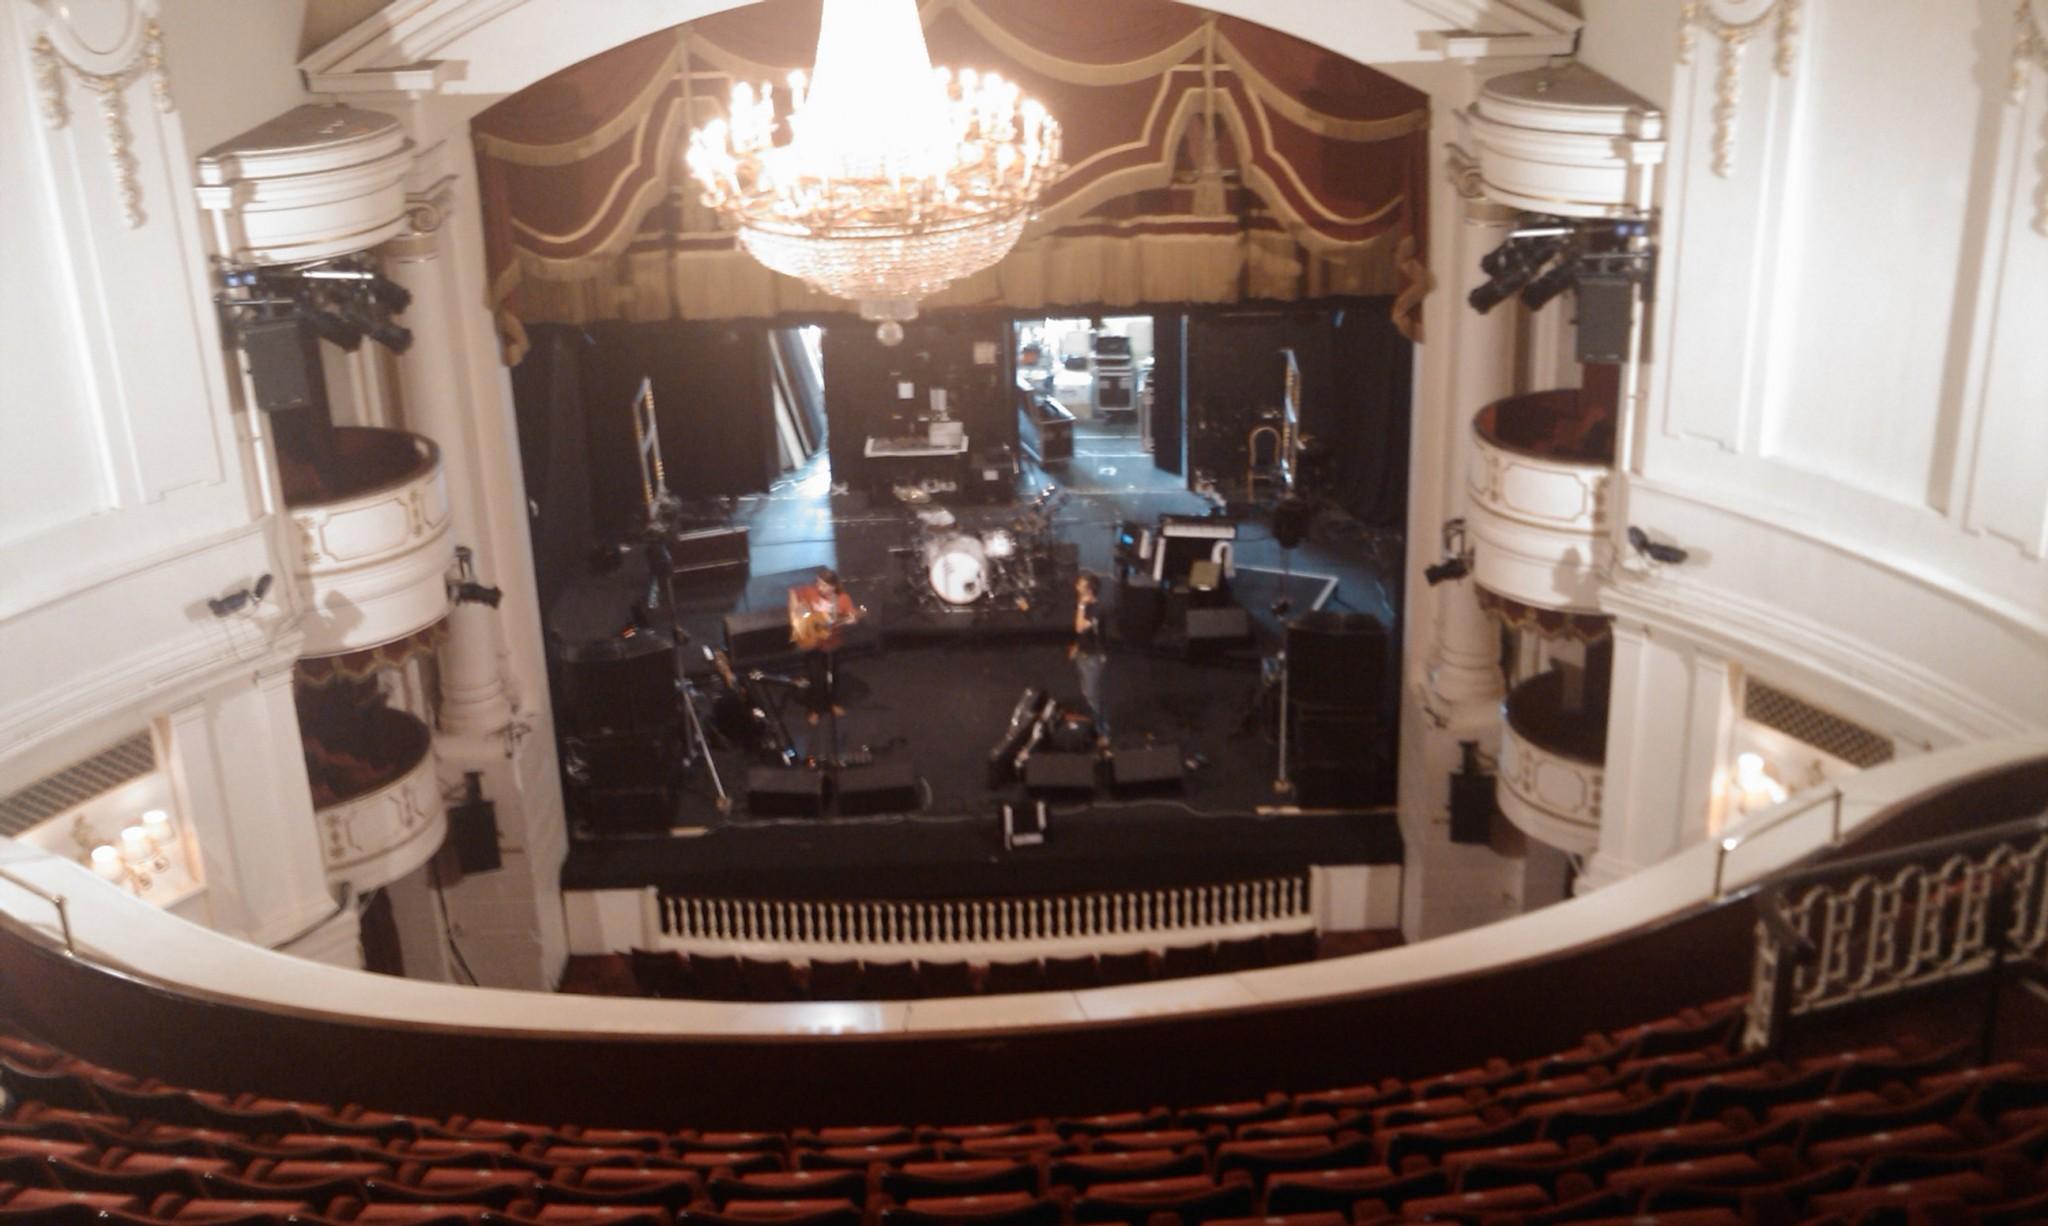 Thinnk Floyd, Windsor Theatre Royal